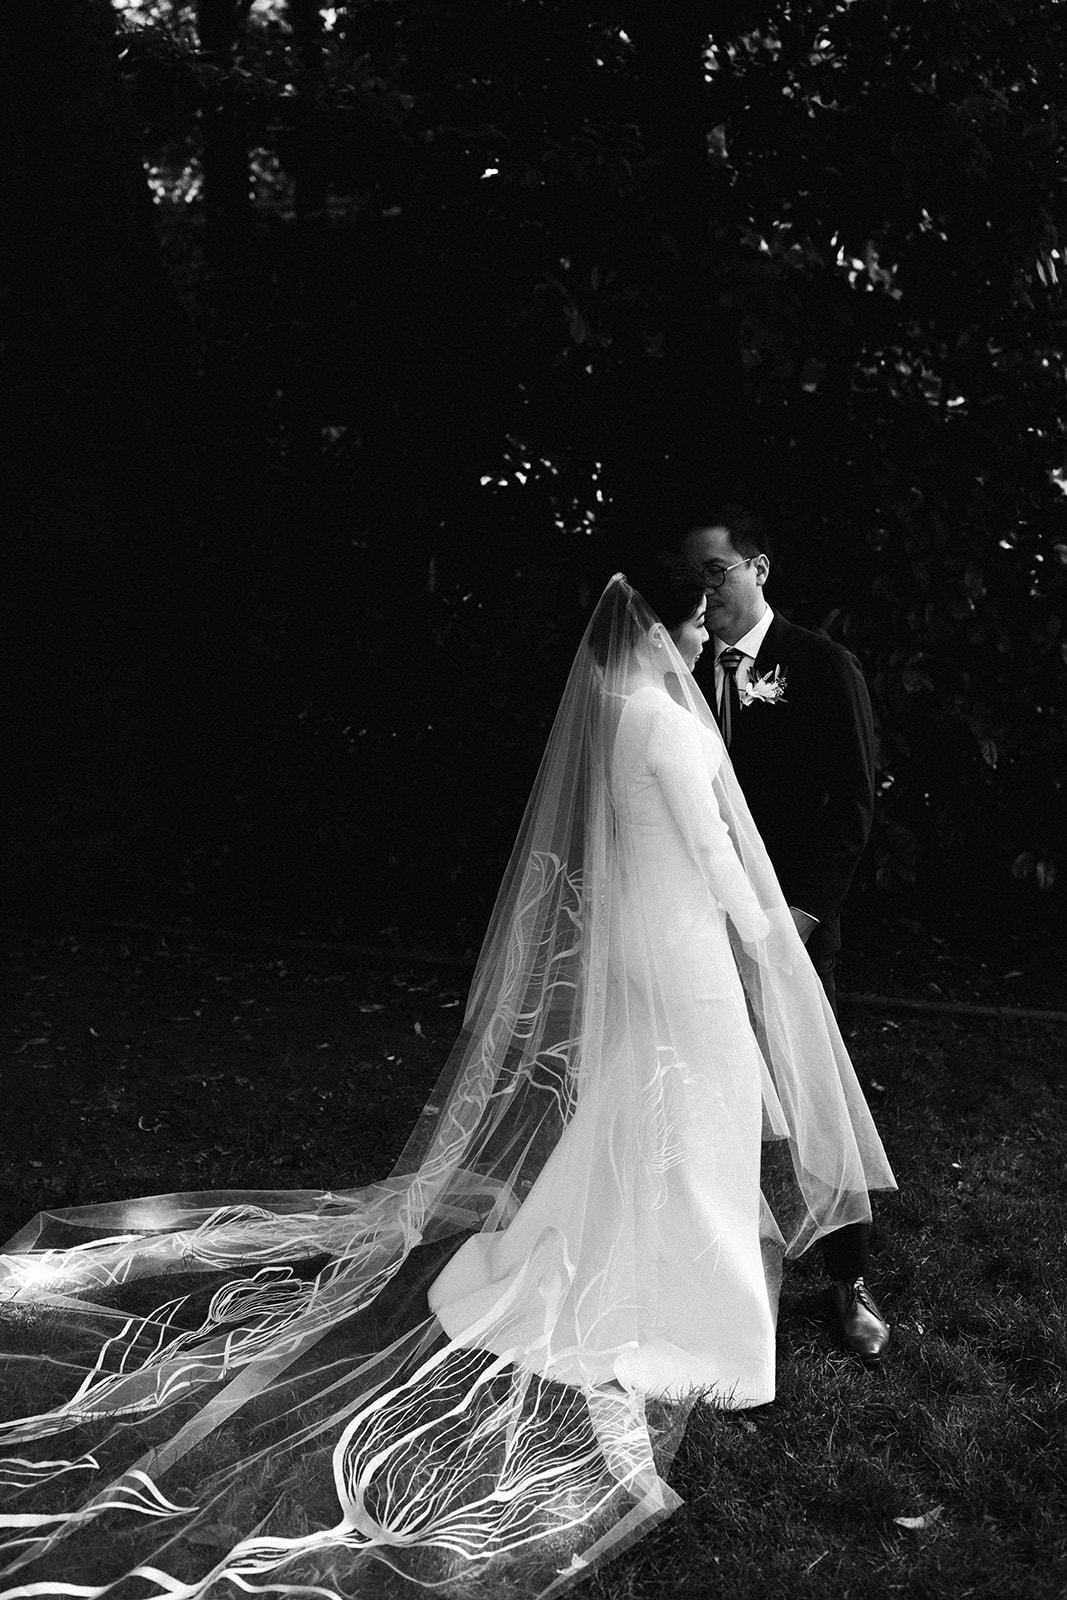 WiandaBongenPhotography-Cassandra_Ben-Wedding-131.jpg